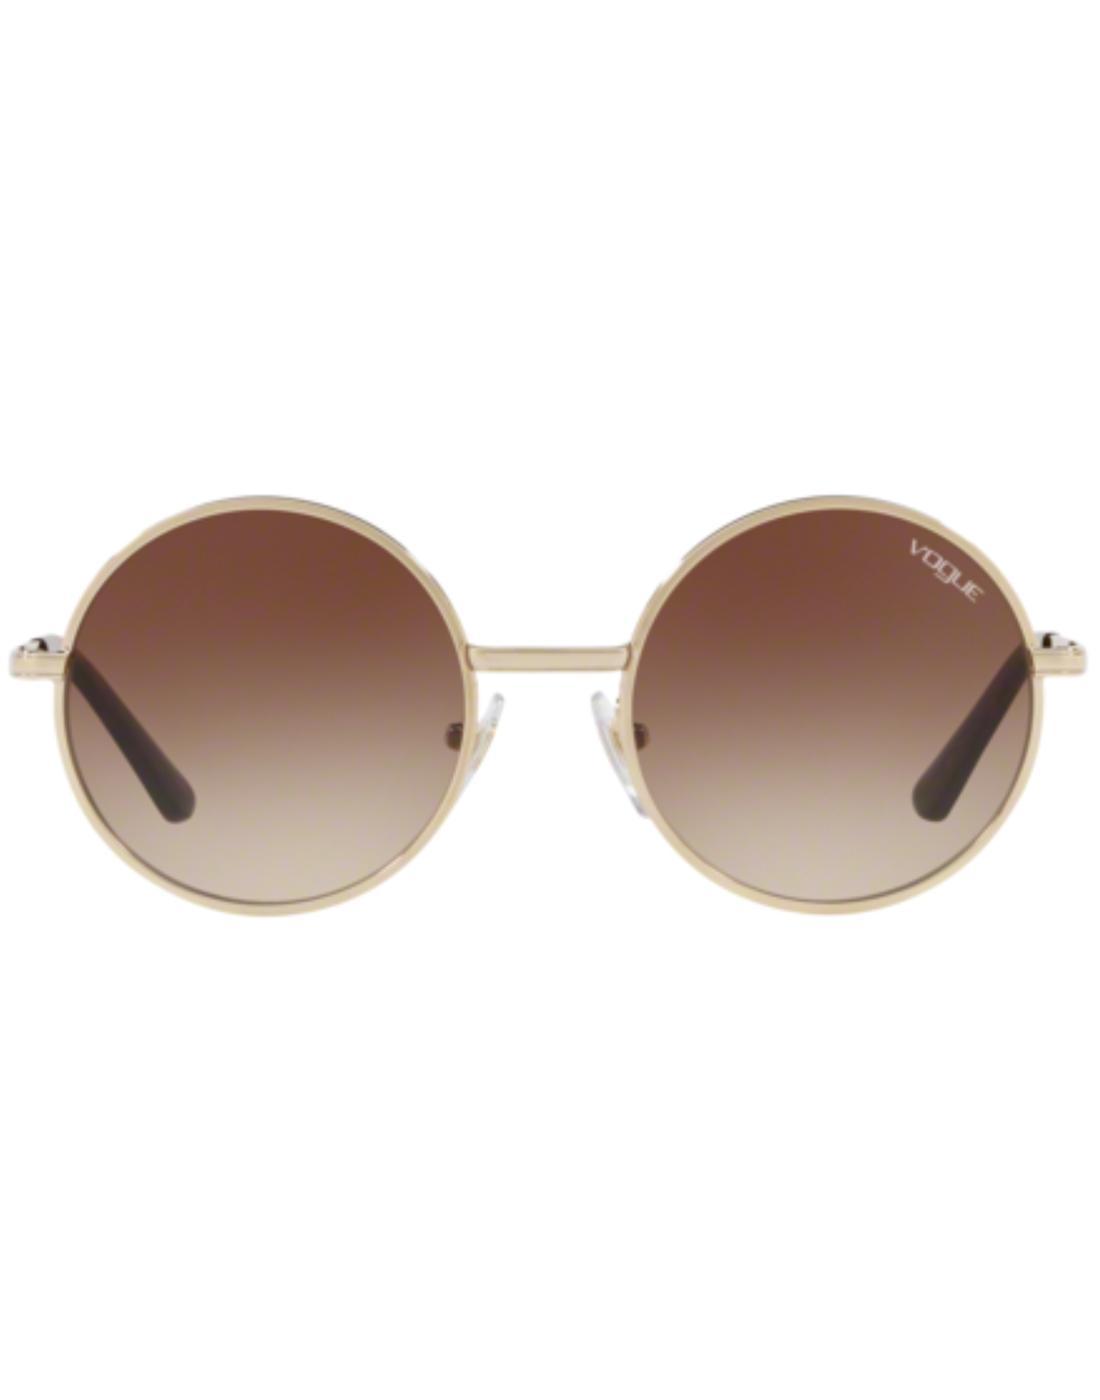 VOGUE Gigi Hadid Retro 60s Vintage Sunglasses B